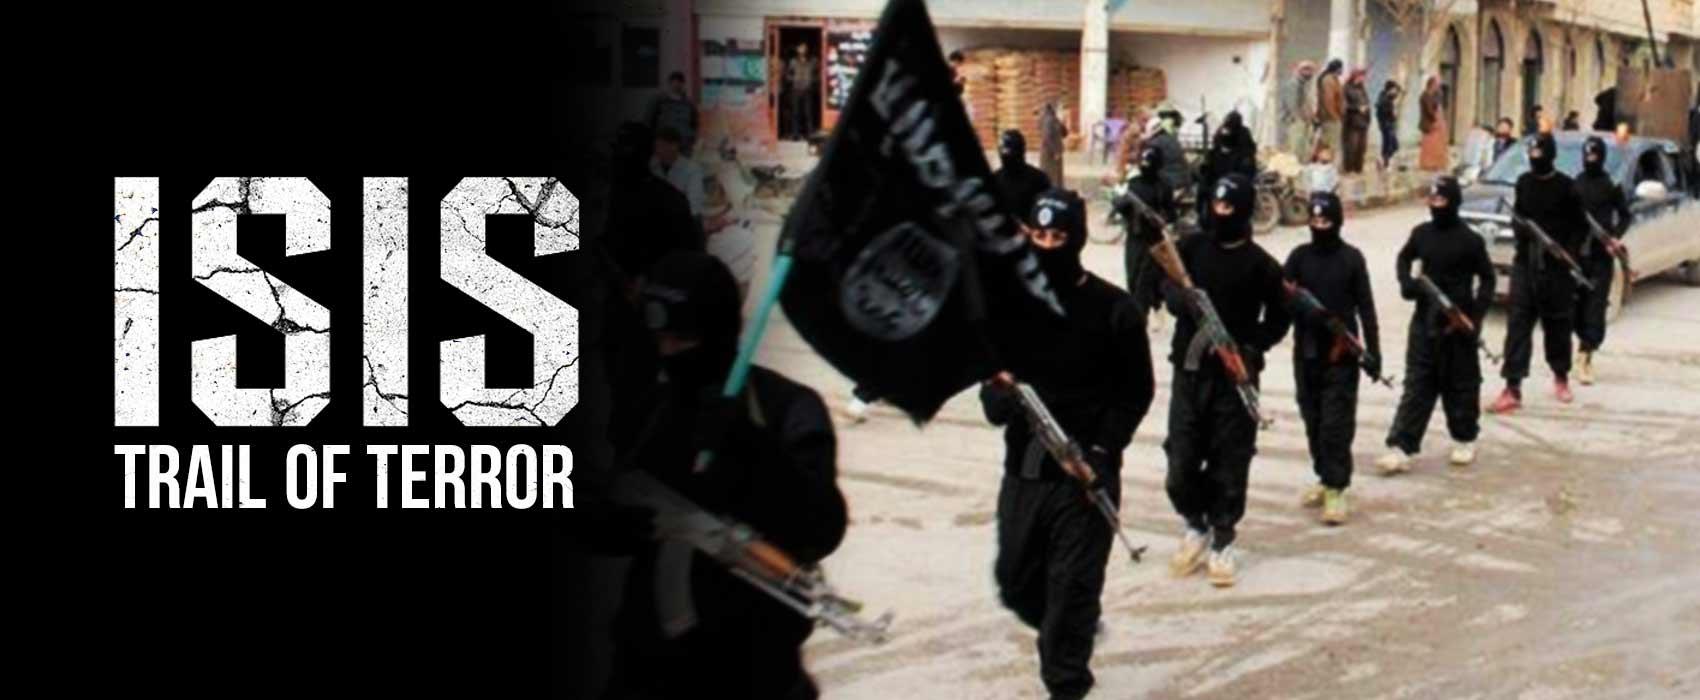 ISIS-marathipizza01